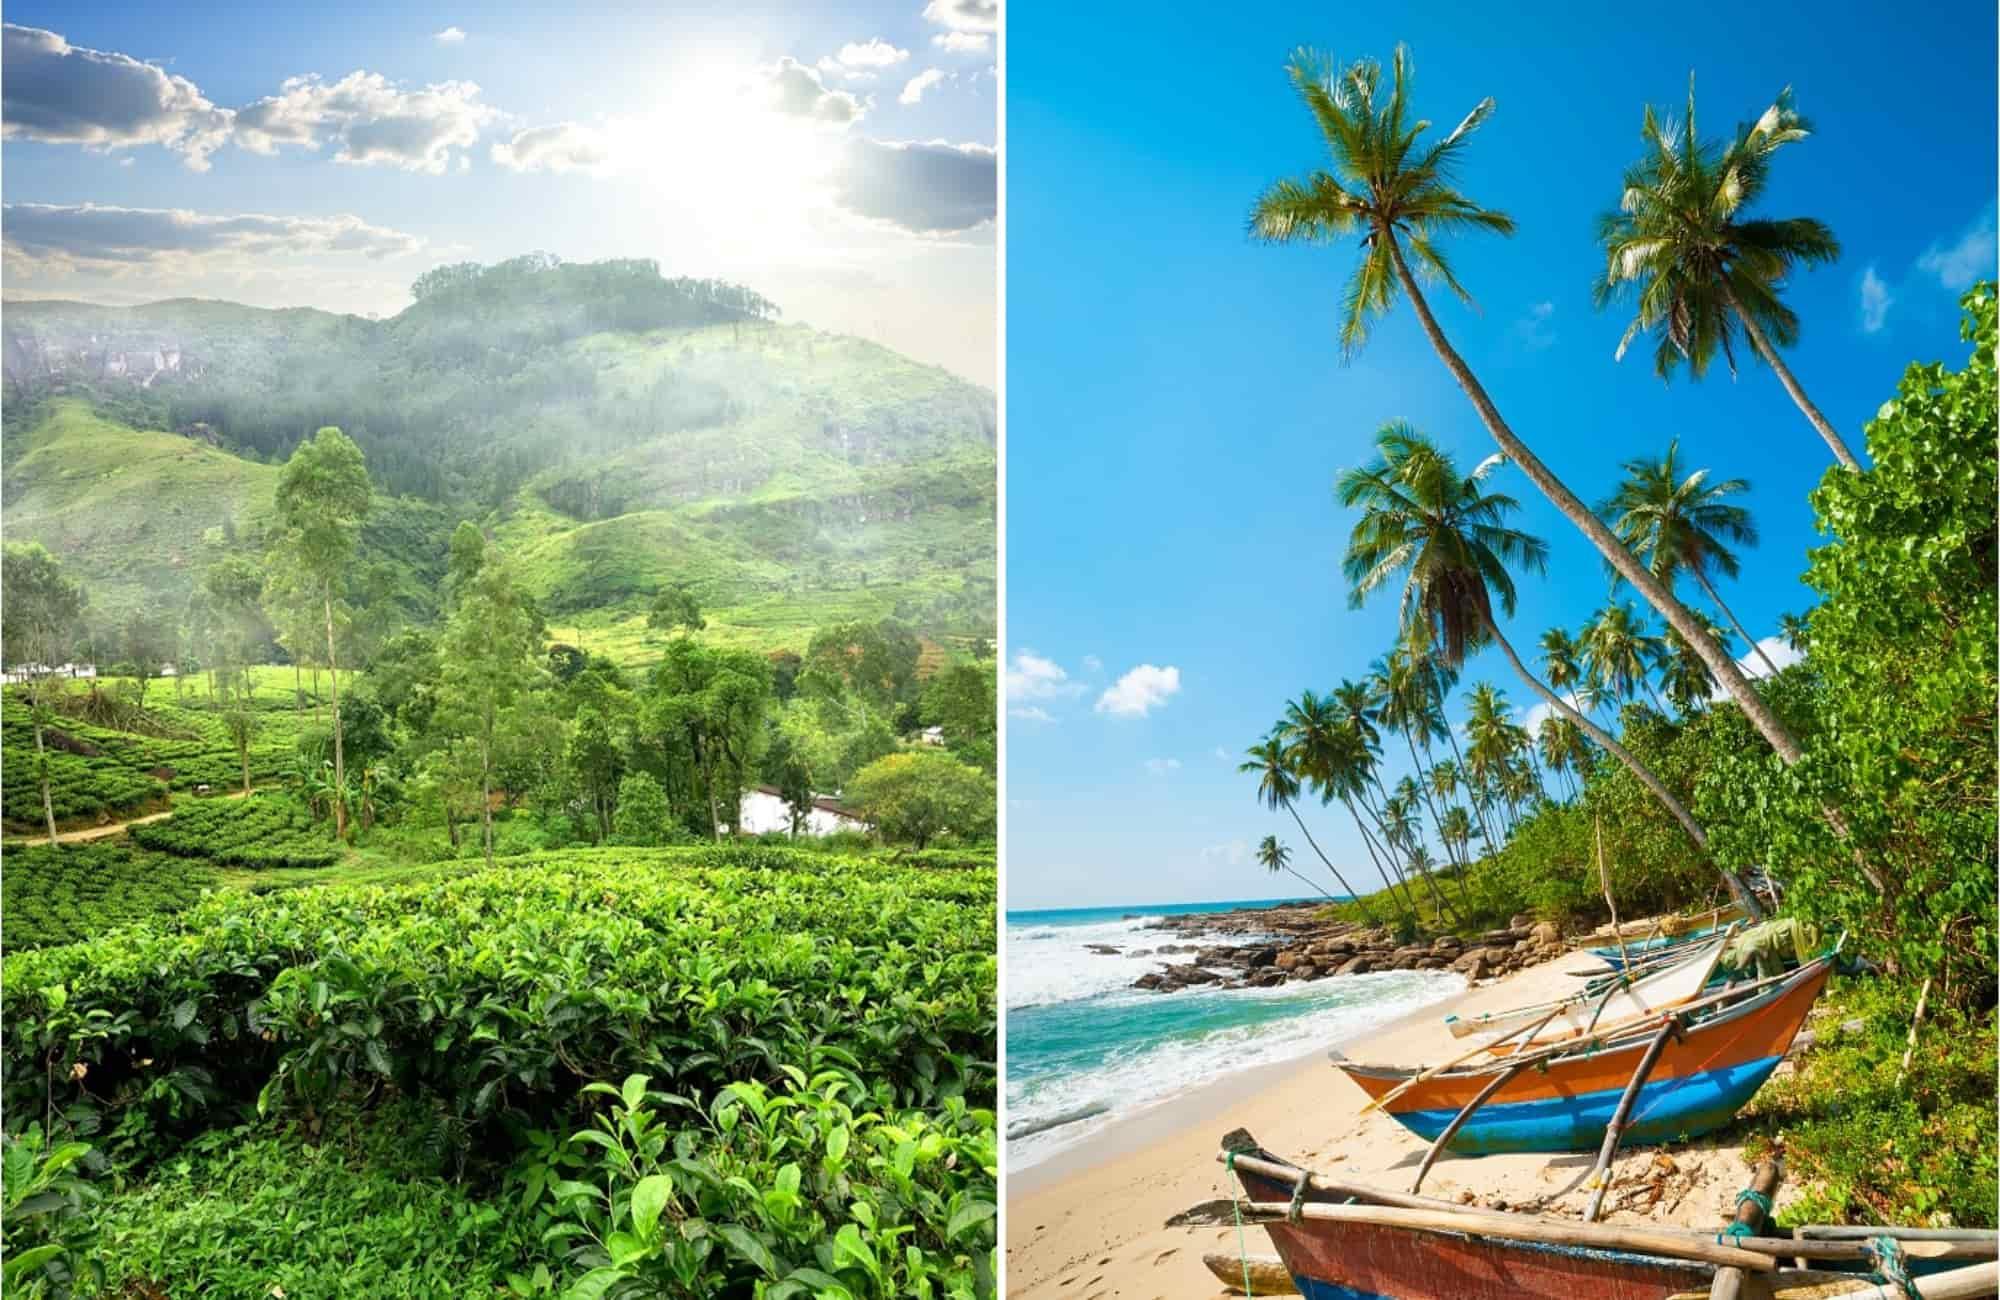 Voyage Sri-Lanka/ Maldives - Paysages d'Asie - Amplitudes